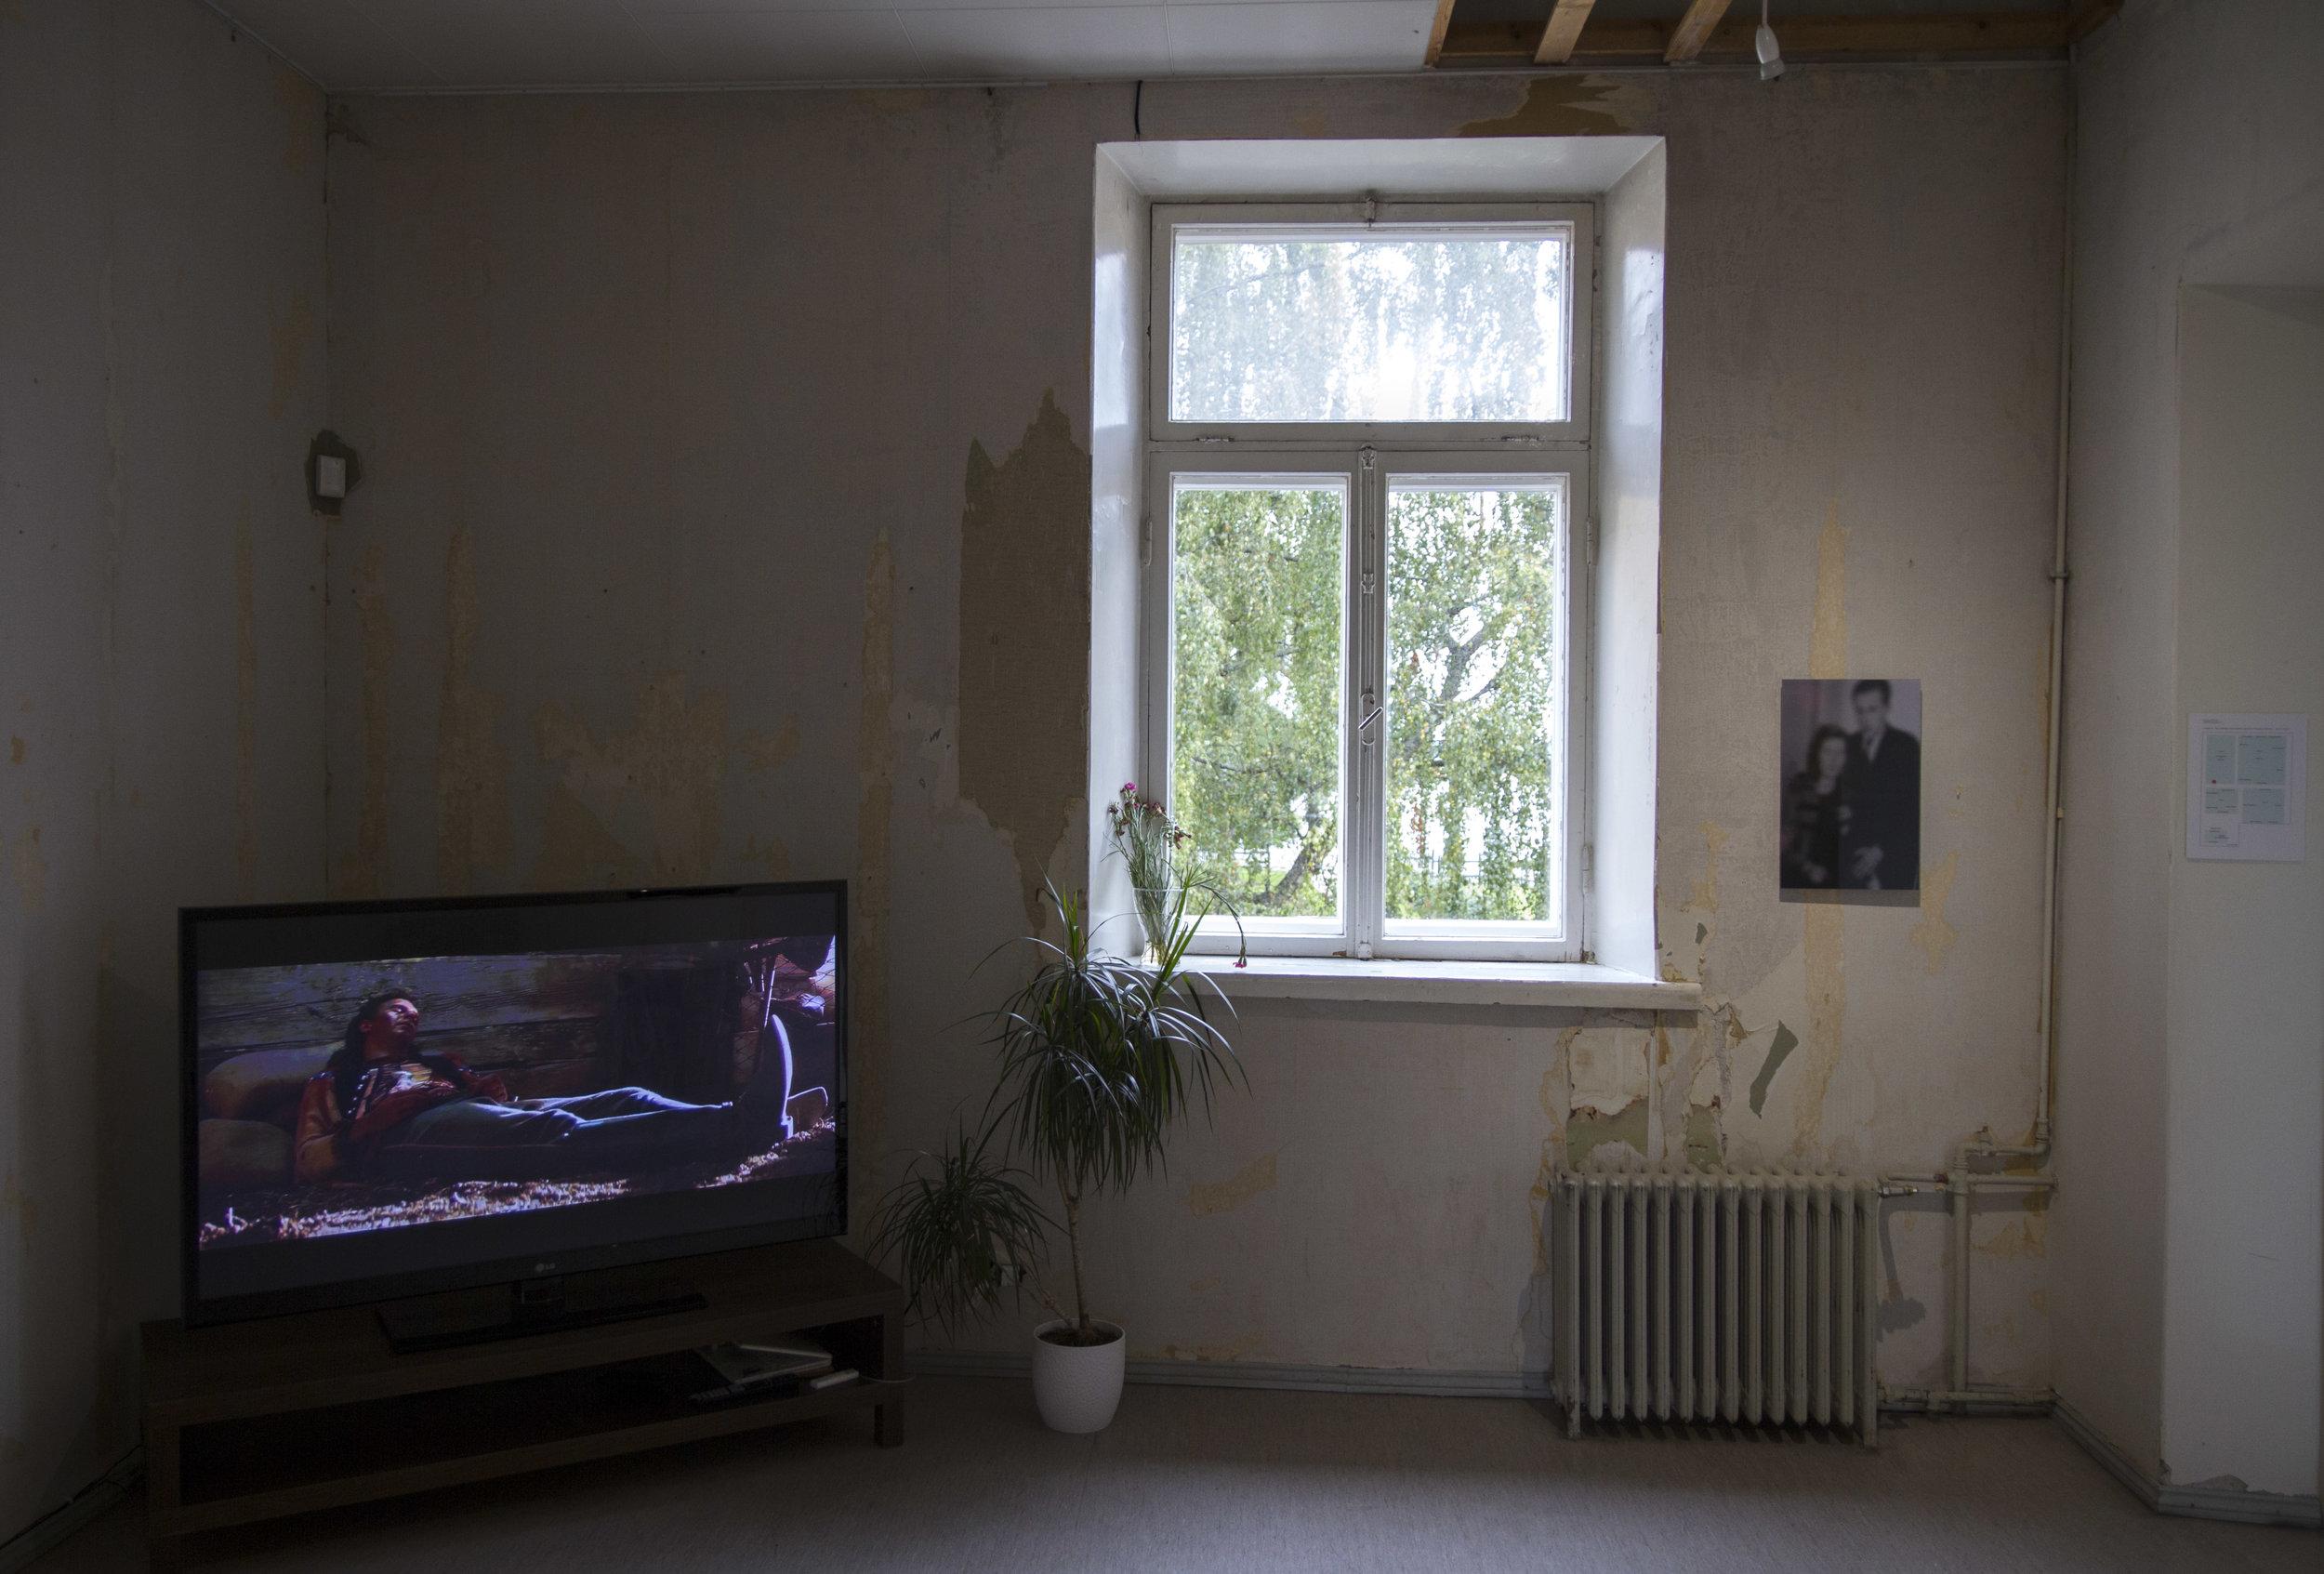 Installation view, left: Joakim Pusenius:  Anamnesis  (2014) and right: Sampo Apajalahti:  Muistojen huoneet (kihlakuva)  (2014)